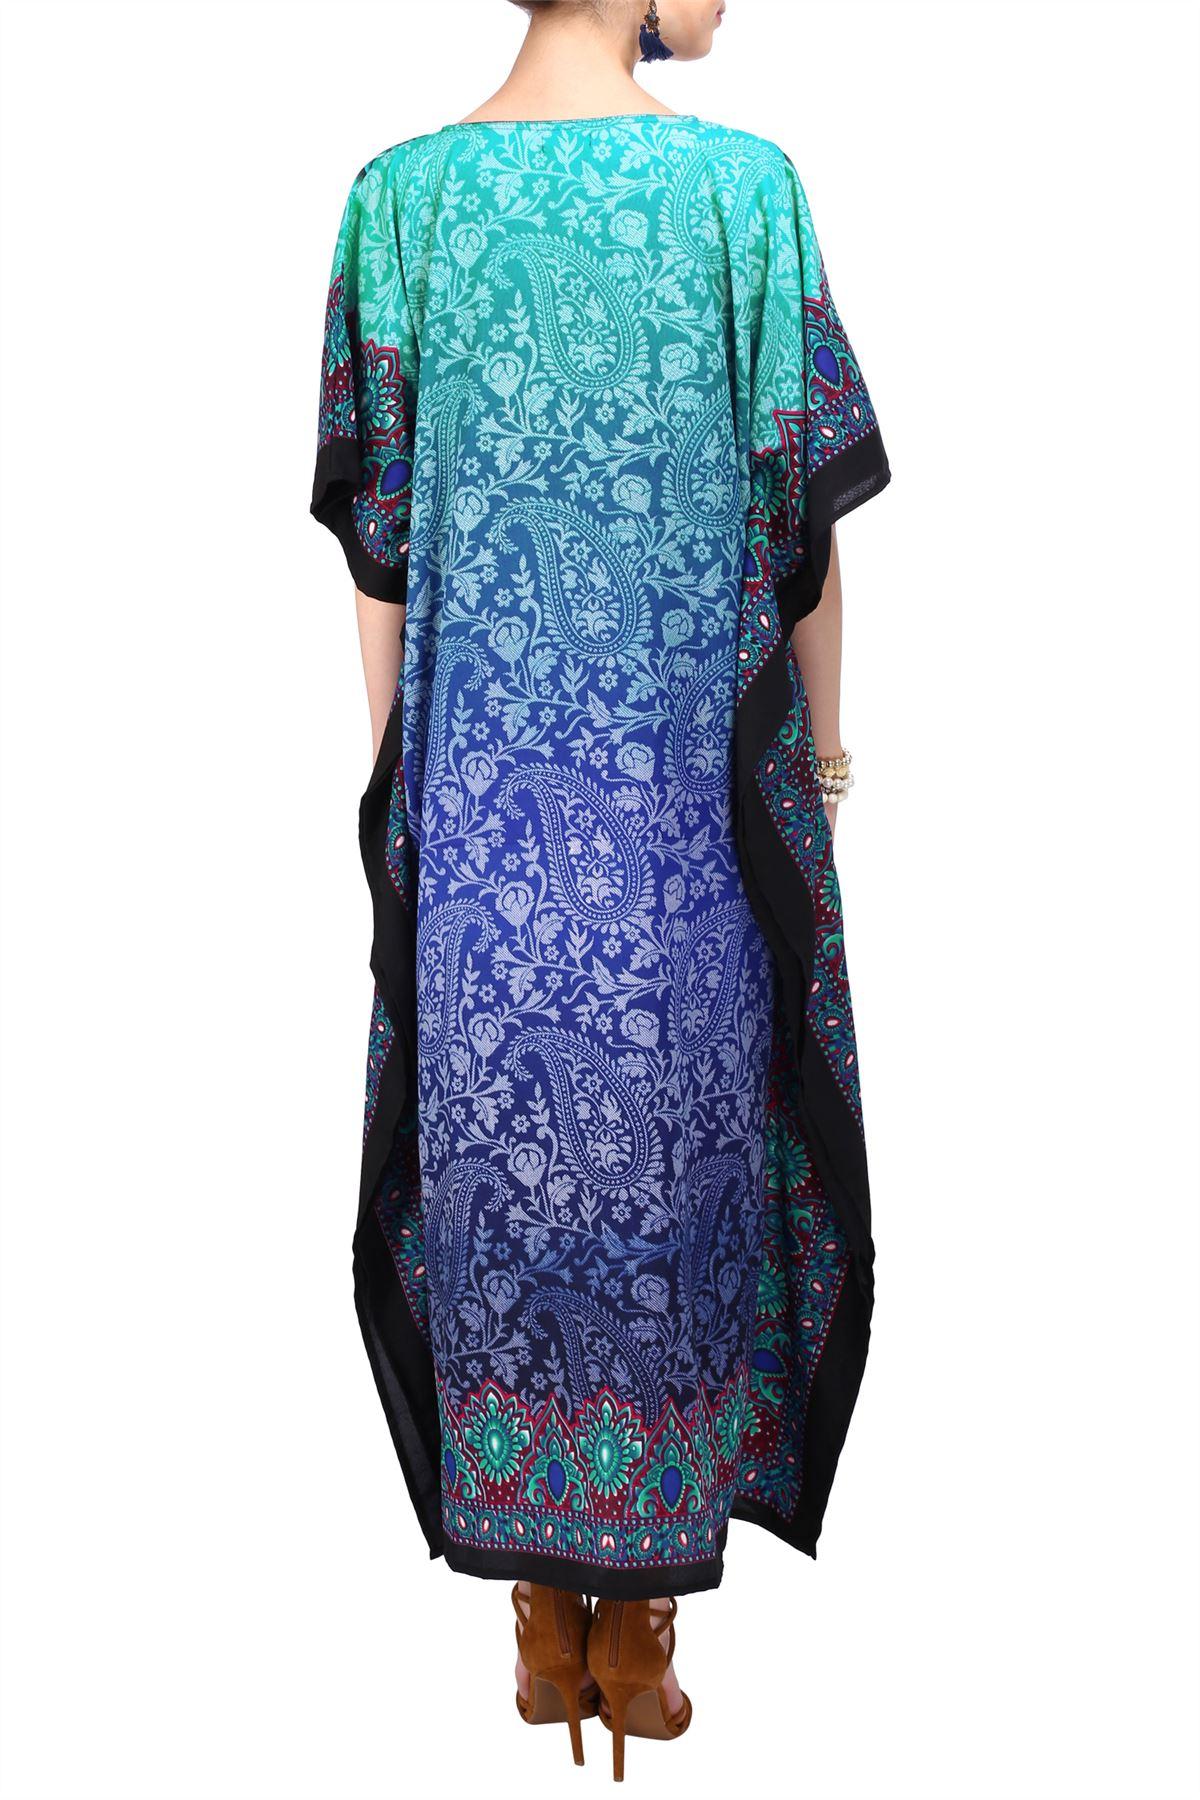 Women-Kaftan-Tunic-Kimono-Free-Size-Long-Maxi-Party-Dress-for-Loungewear